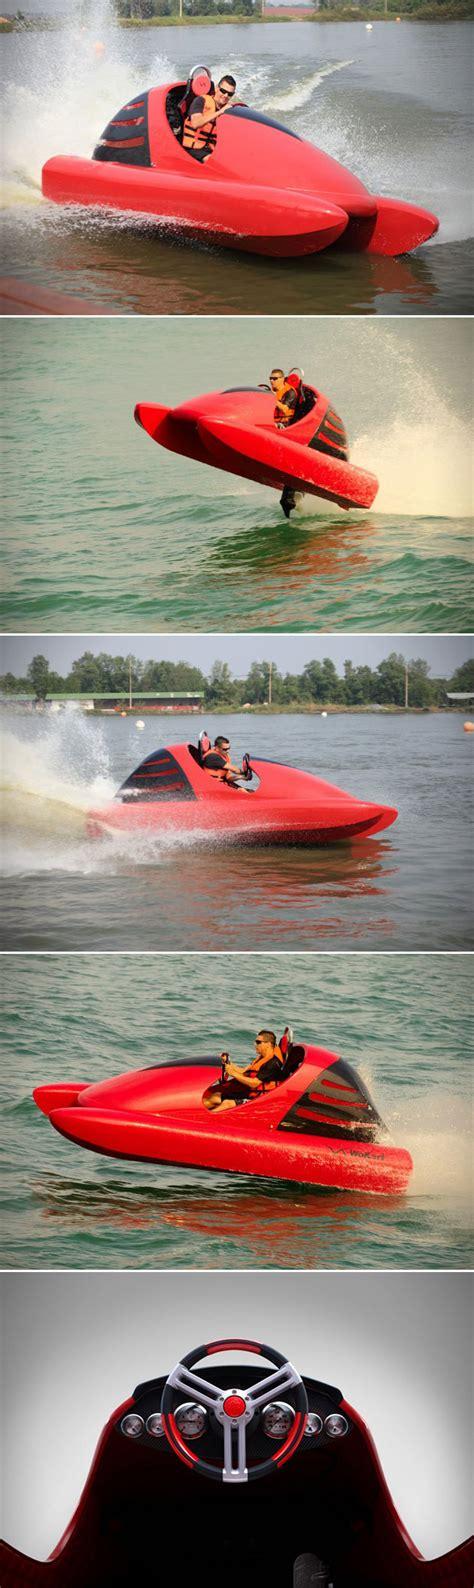 jet ski motor on go kart when go kart meets jet ski you get the wokart which can